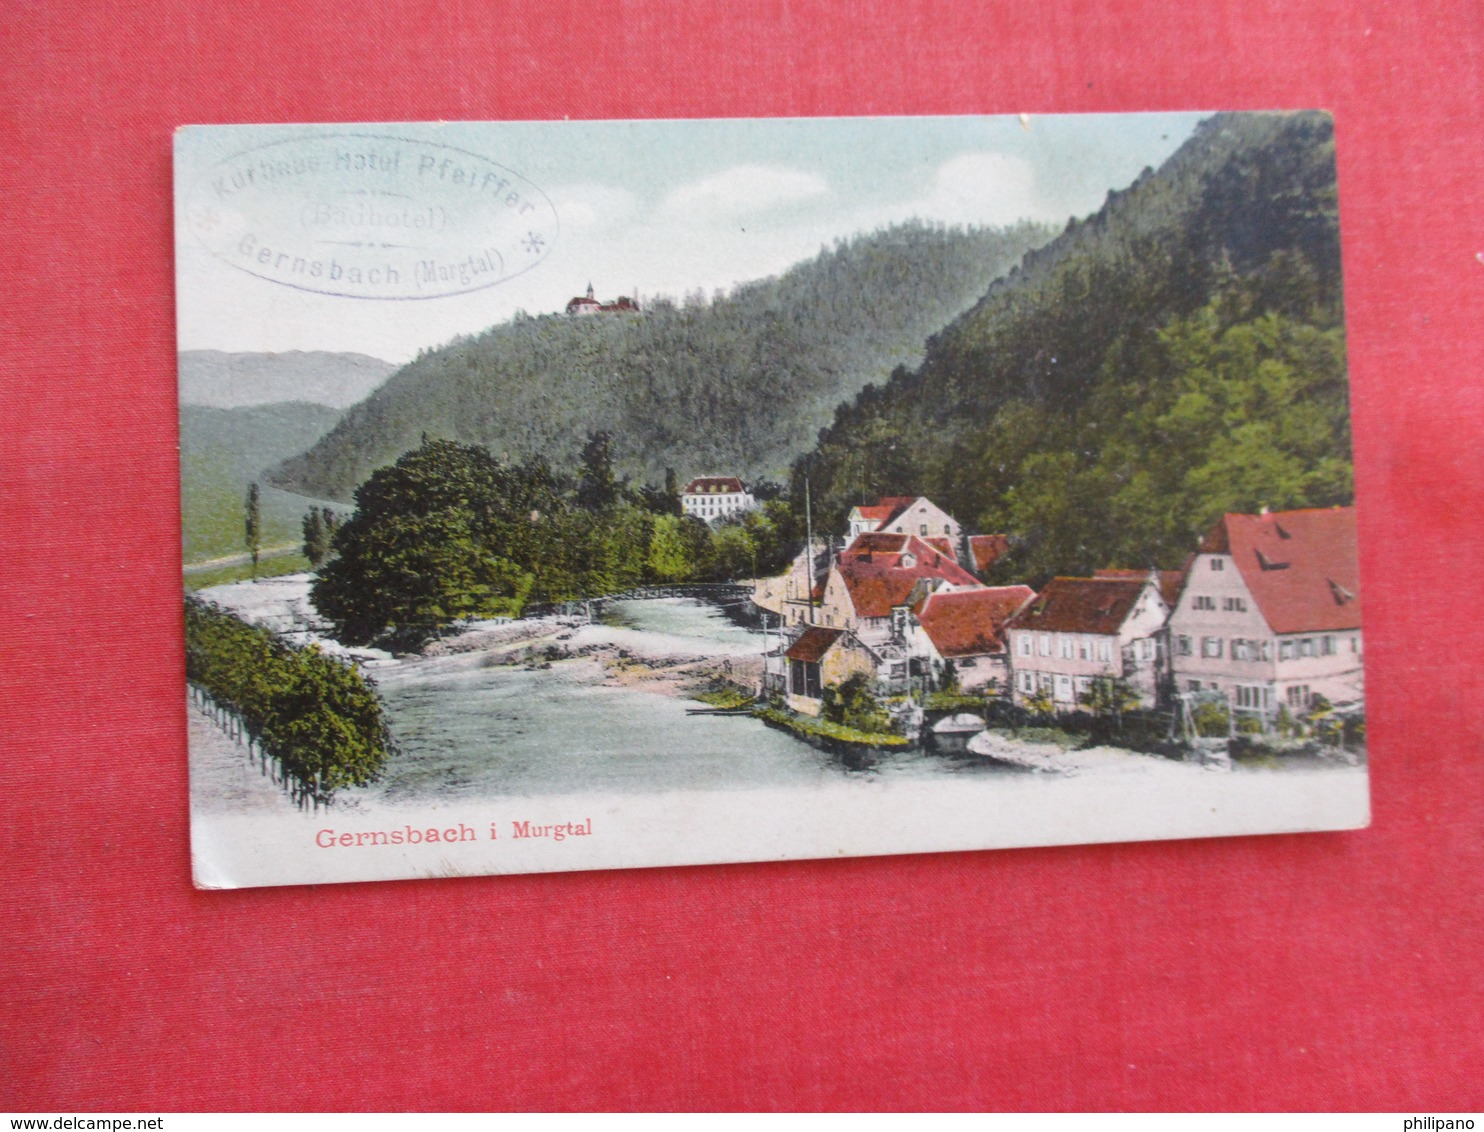 Germany > Baden-Wurttemberg > Gernsbach  I Murgtal  Ref 2867 - Gernsbach